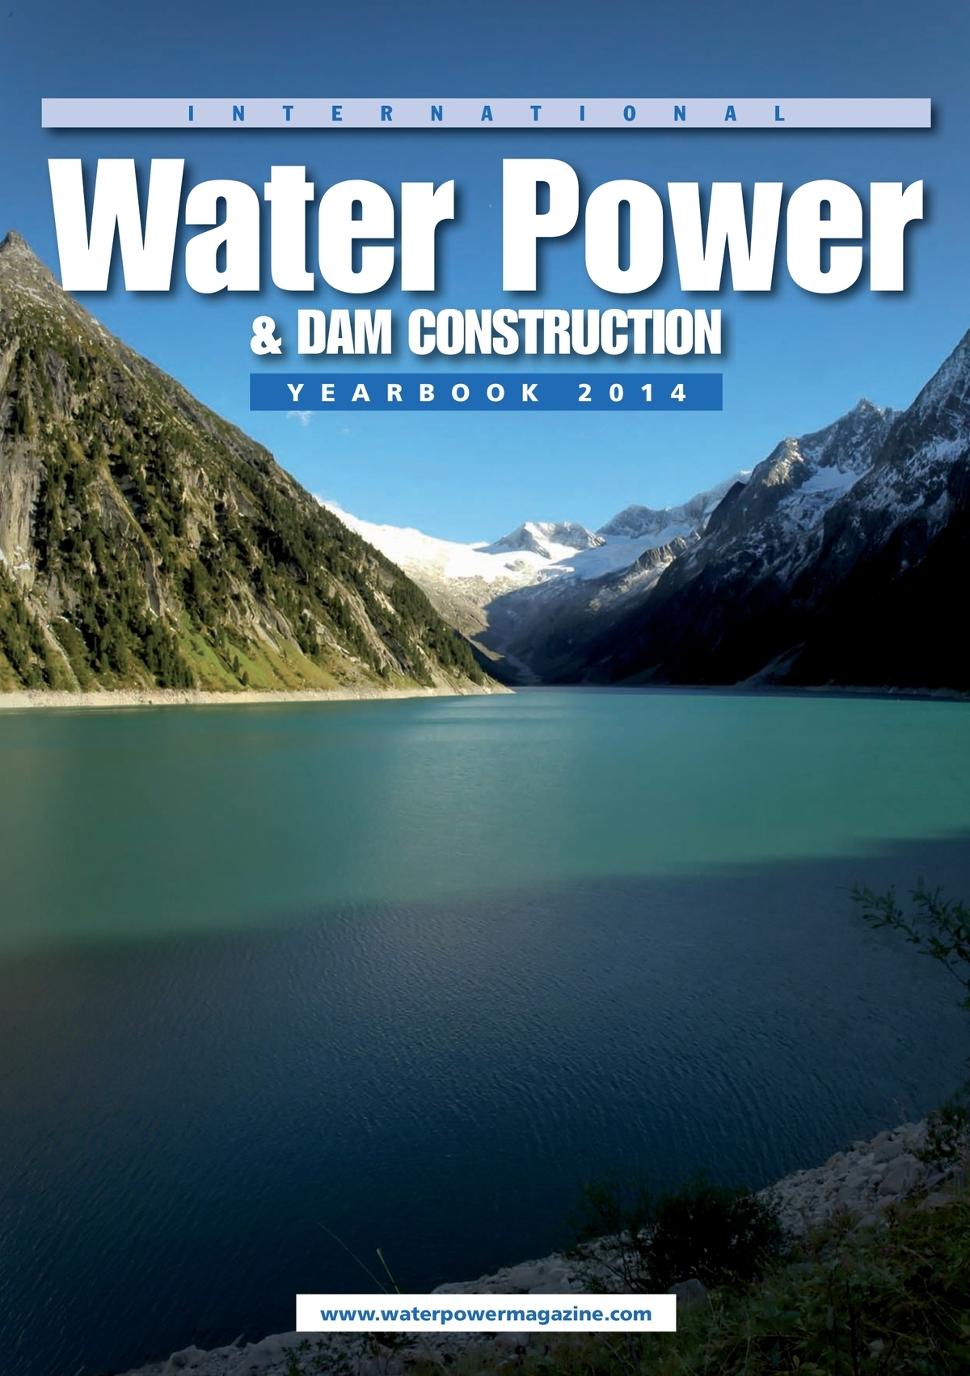 Water Power Yearbook 2014